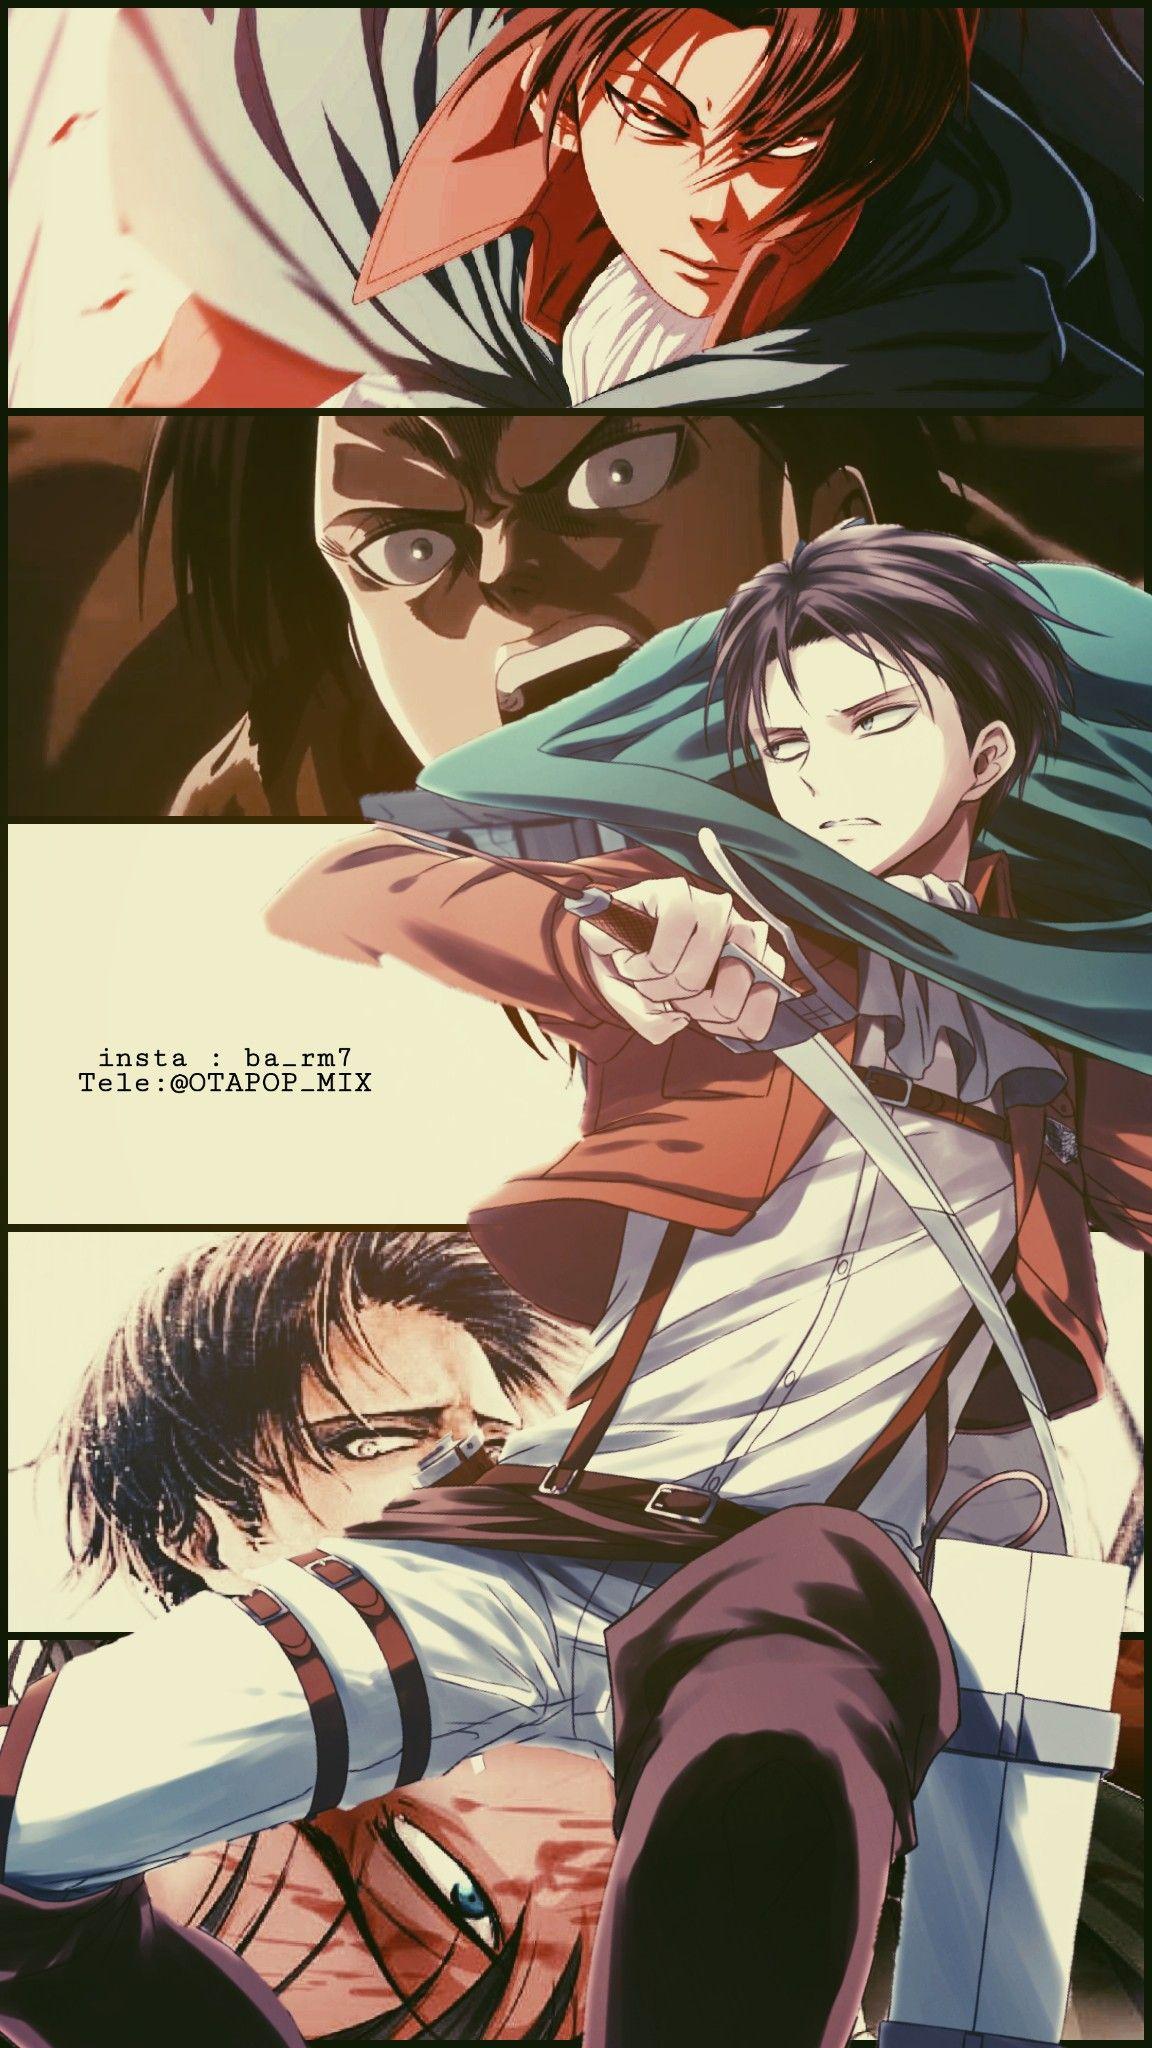 Pin by Bakranmar on design Anime wallpaper iphone, Anime